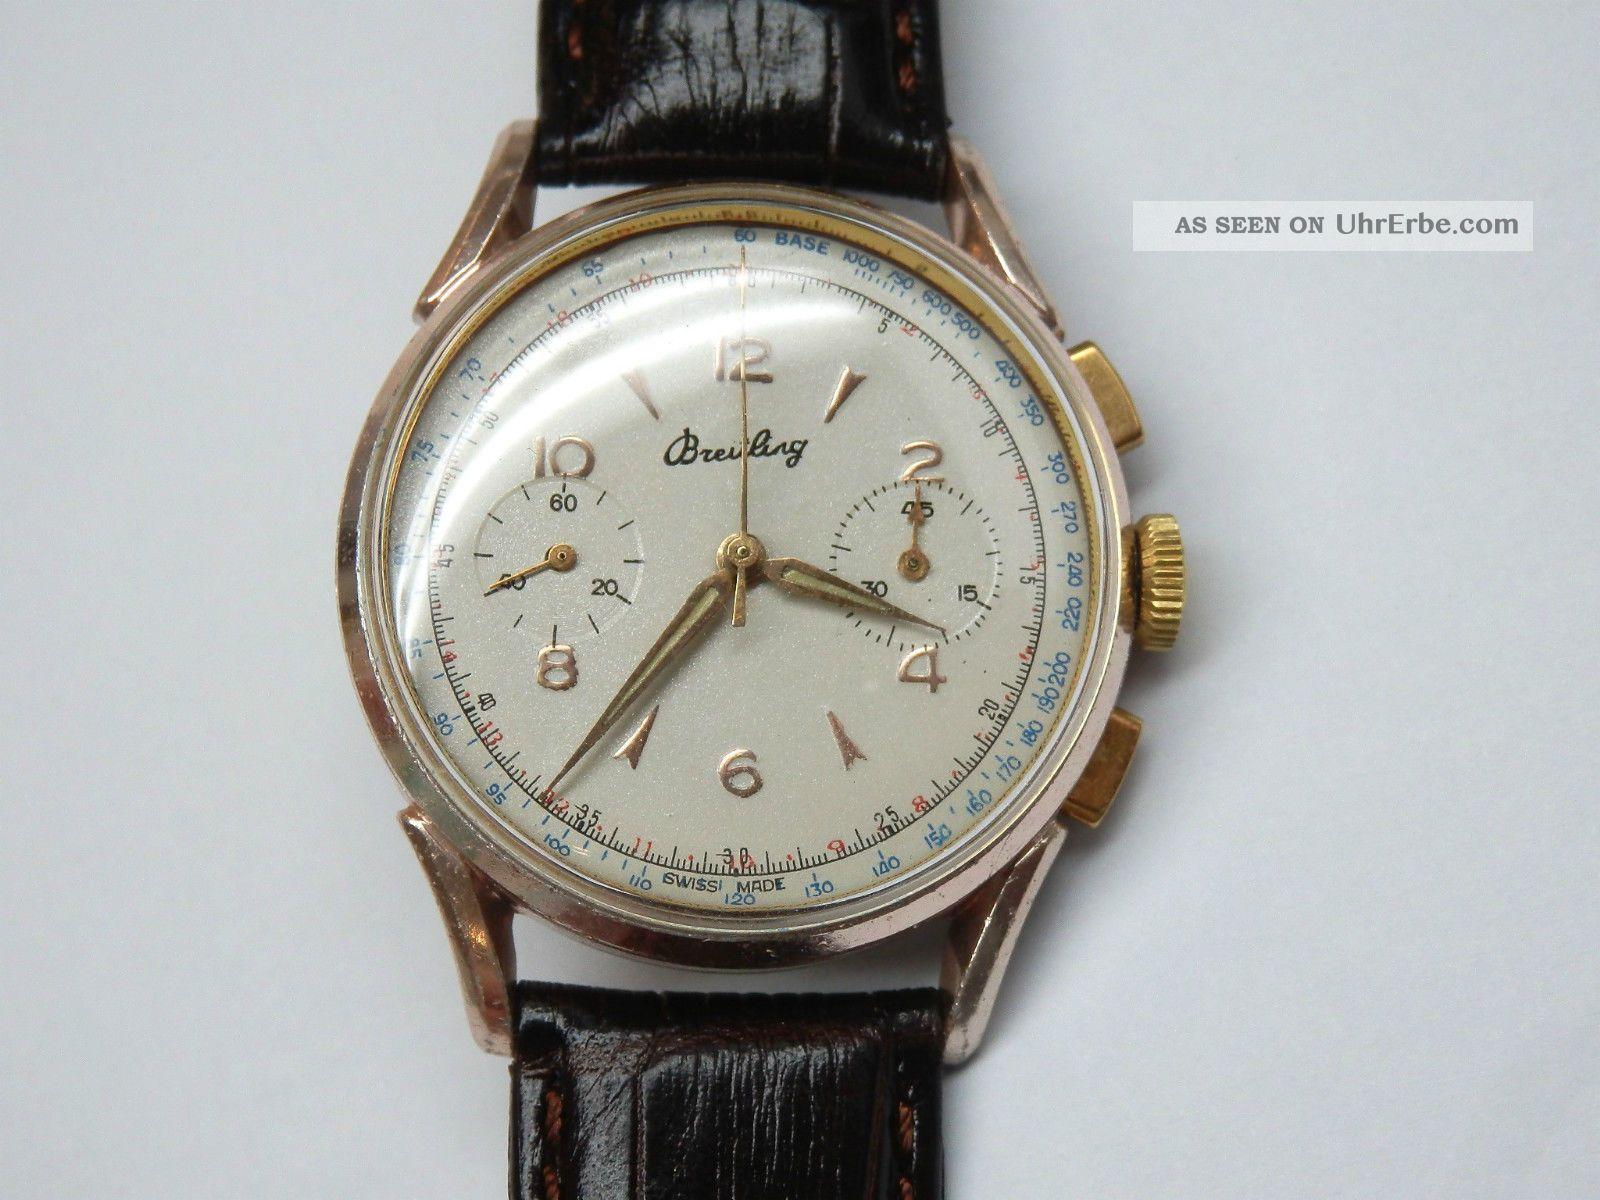 Vintage Breitling Aluminium Chronograph Uhr Kaliber Venus 188 Armbanduhren Bild